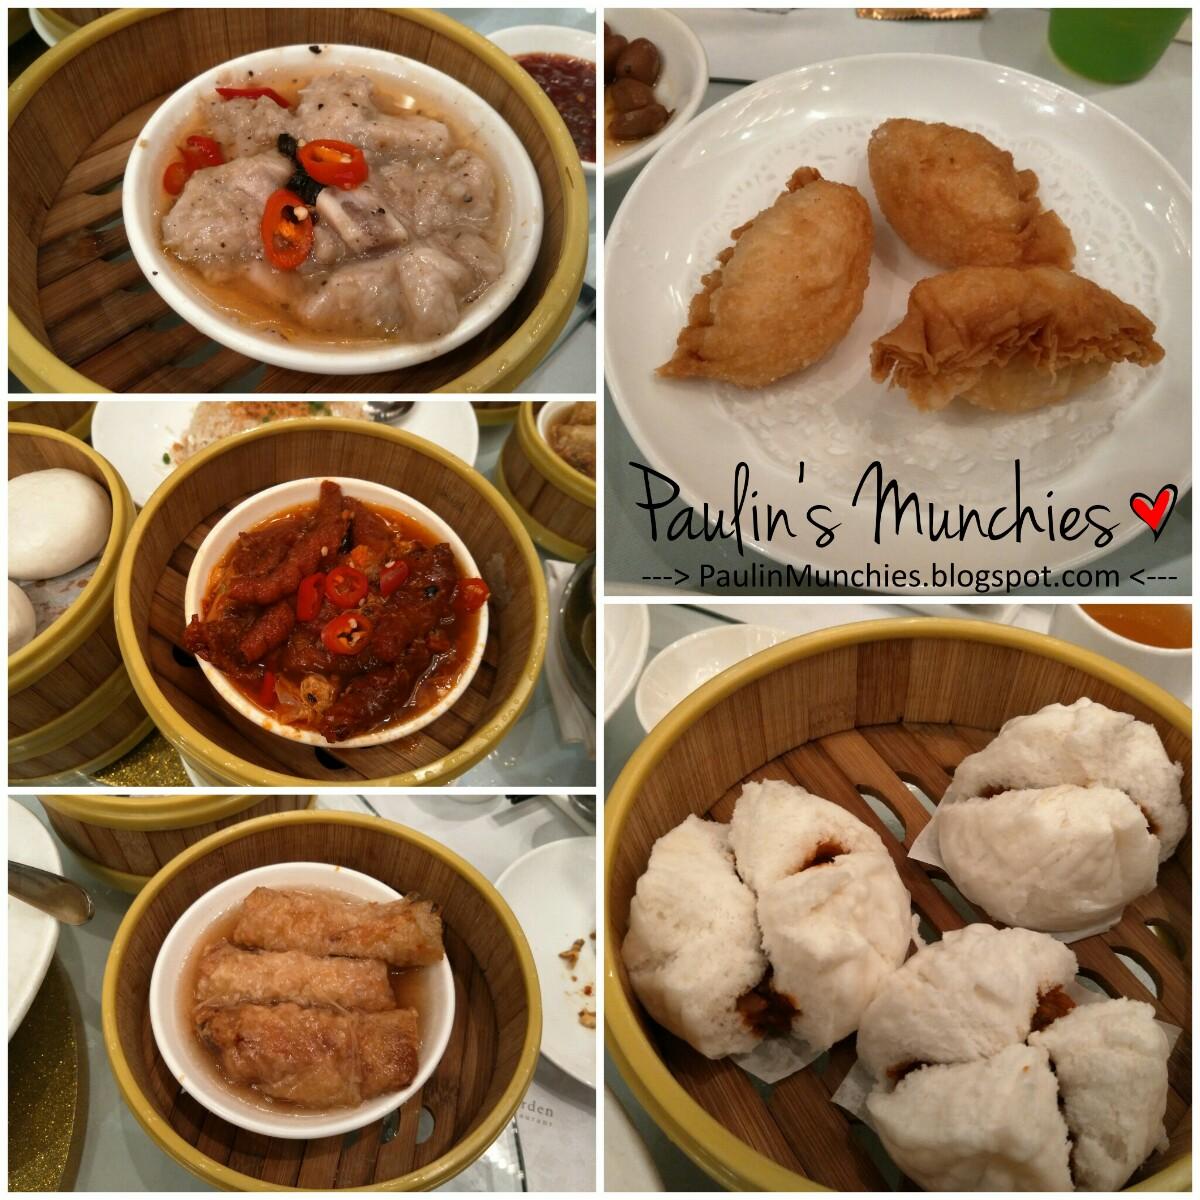 Peach Garden @ Hotel Miramar - Paulin\'s Munchies - My food discoveries.